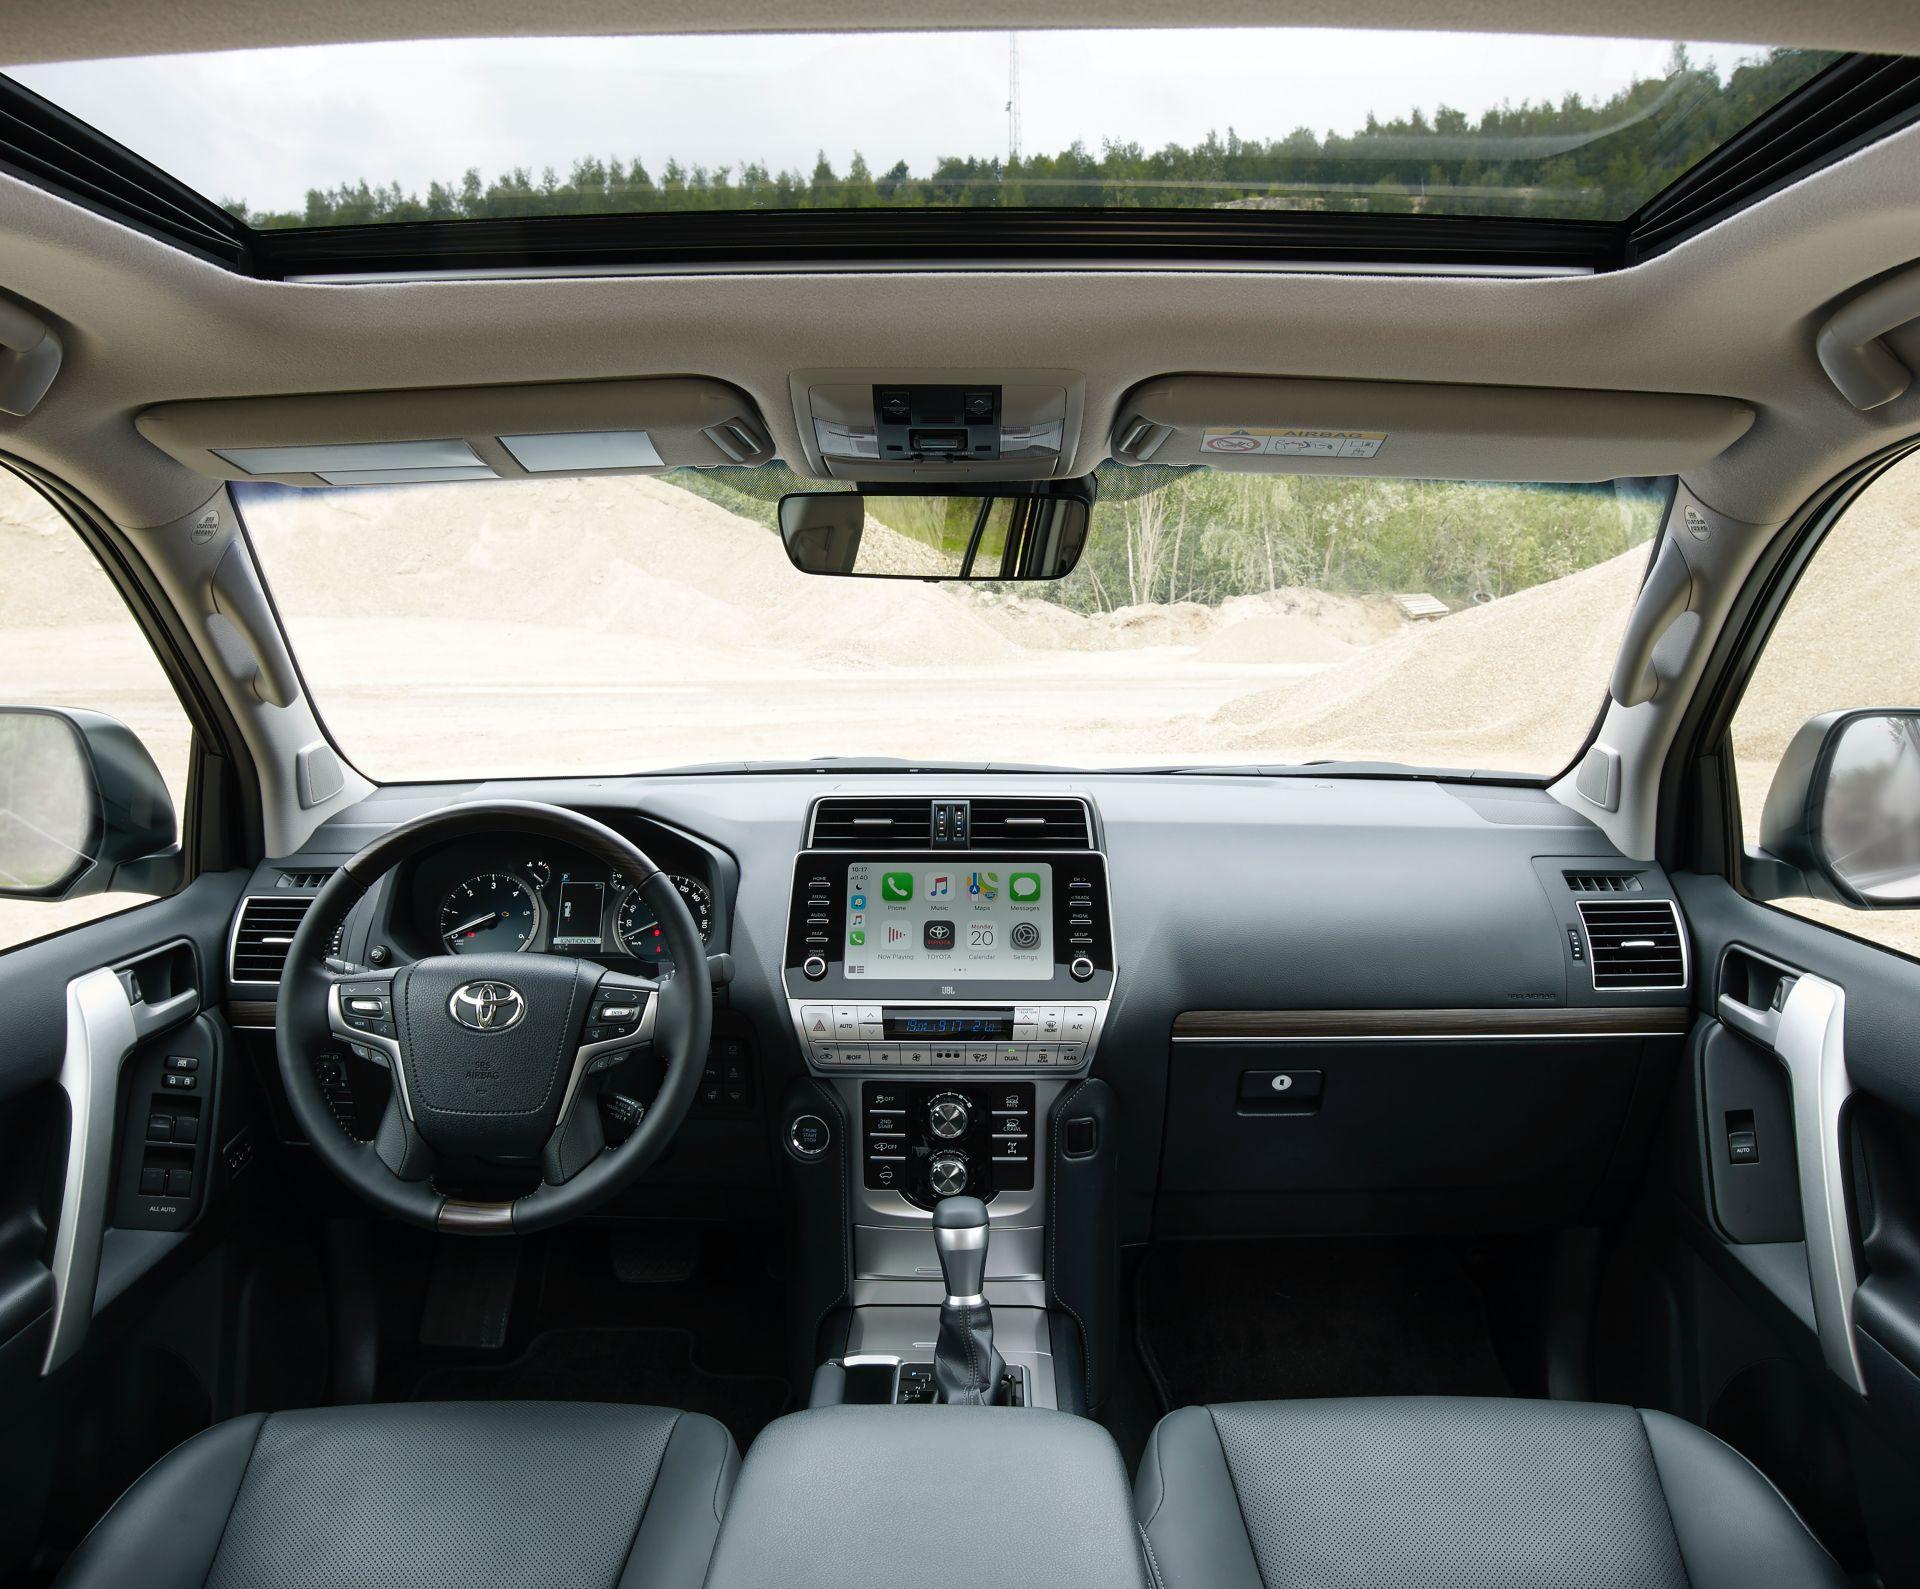 салон нового Toyota Land Cruiser 150 Prado 2021